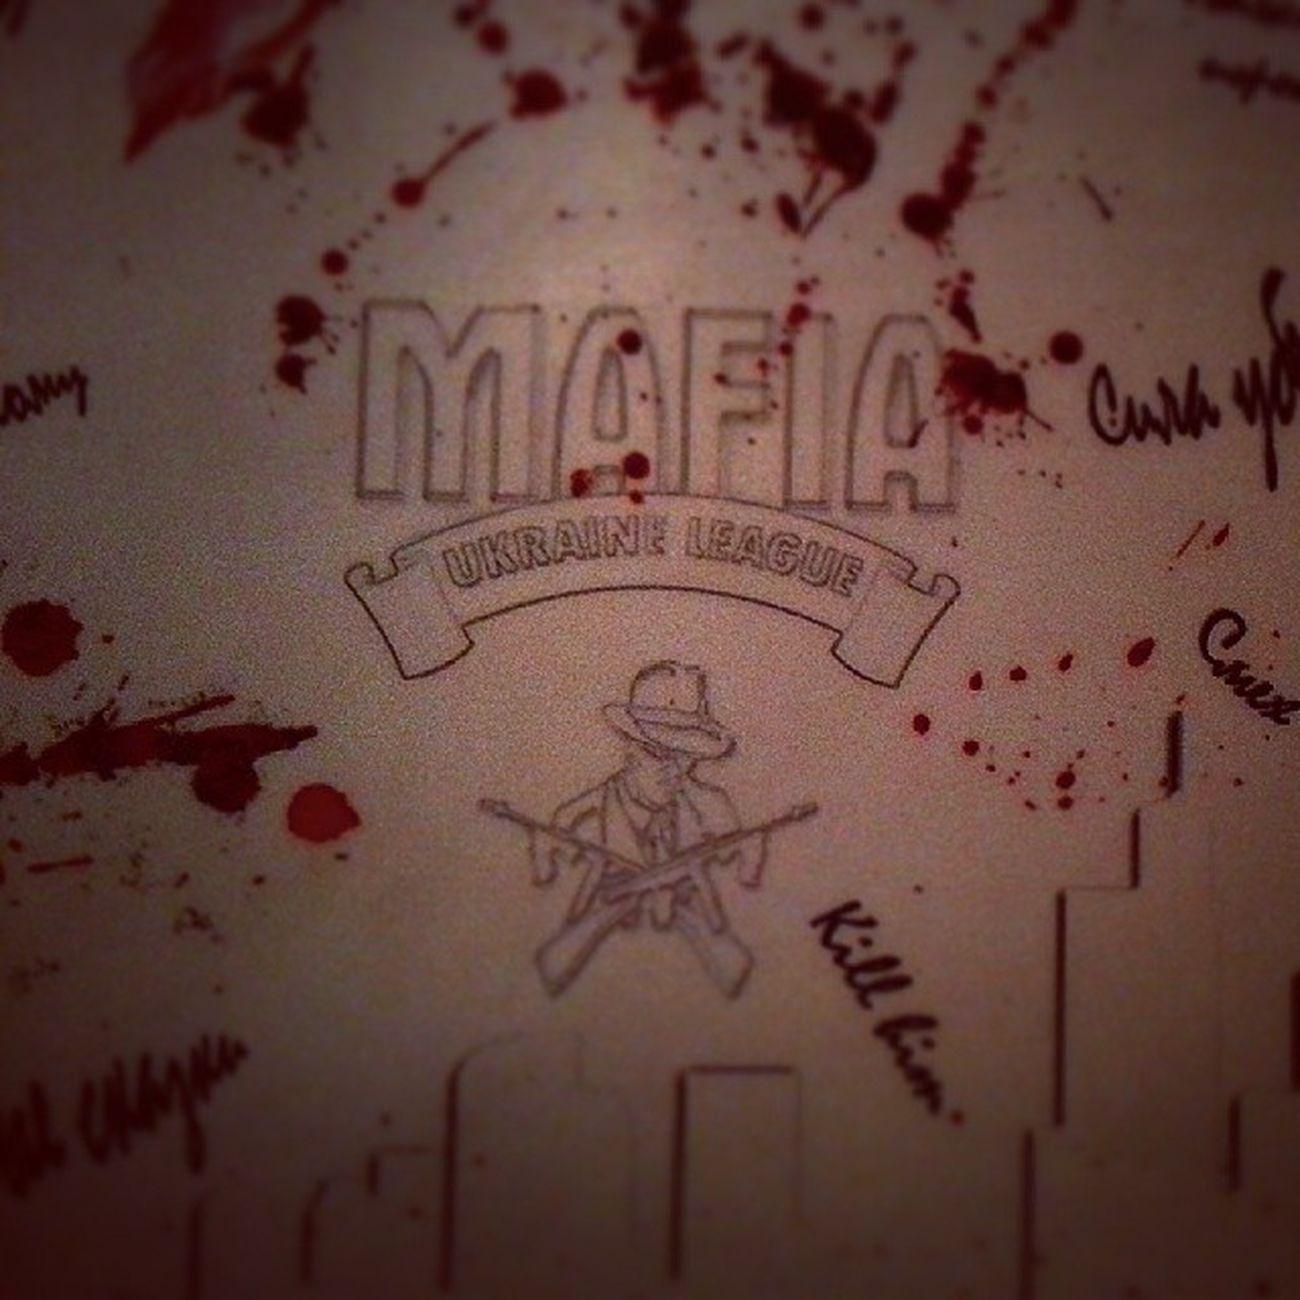 Mafia_crimea_league Mafia_ukraine_league Mafia  мафияигра играмафия мафия werewolf mafiagame gamemafia sevastopol мафиякрым крыммафия ролеваяиграмафия мафиясевастополь севастополь